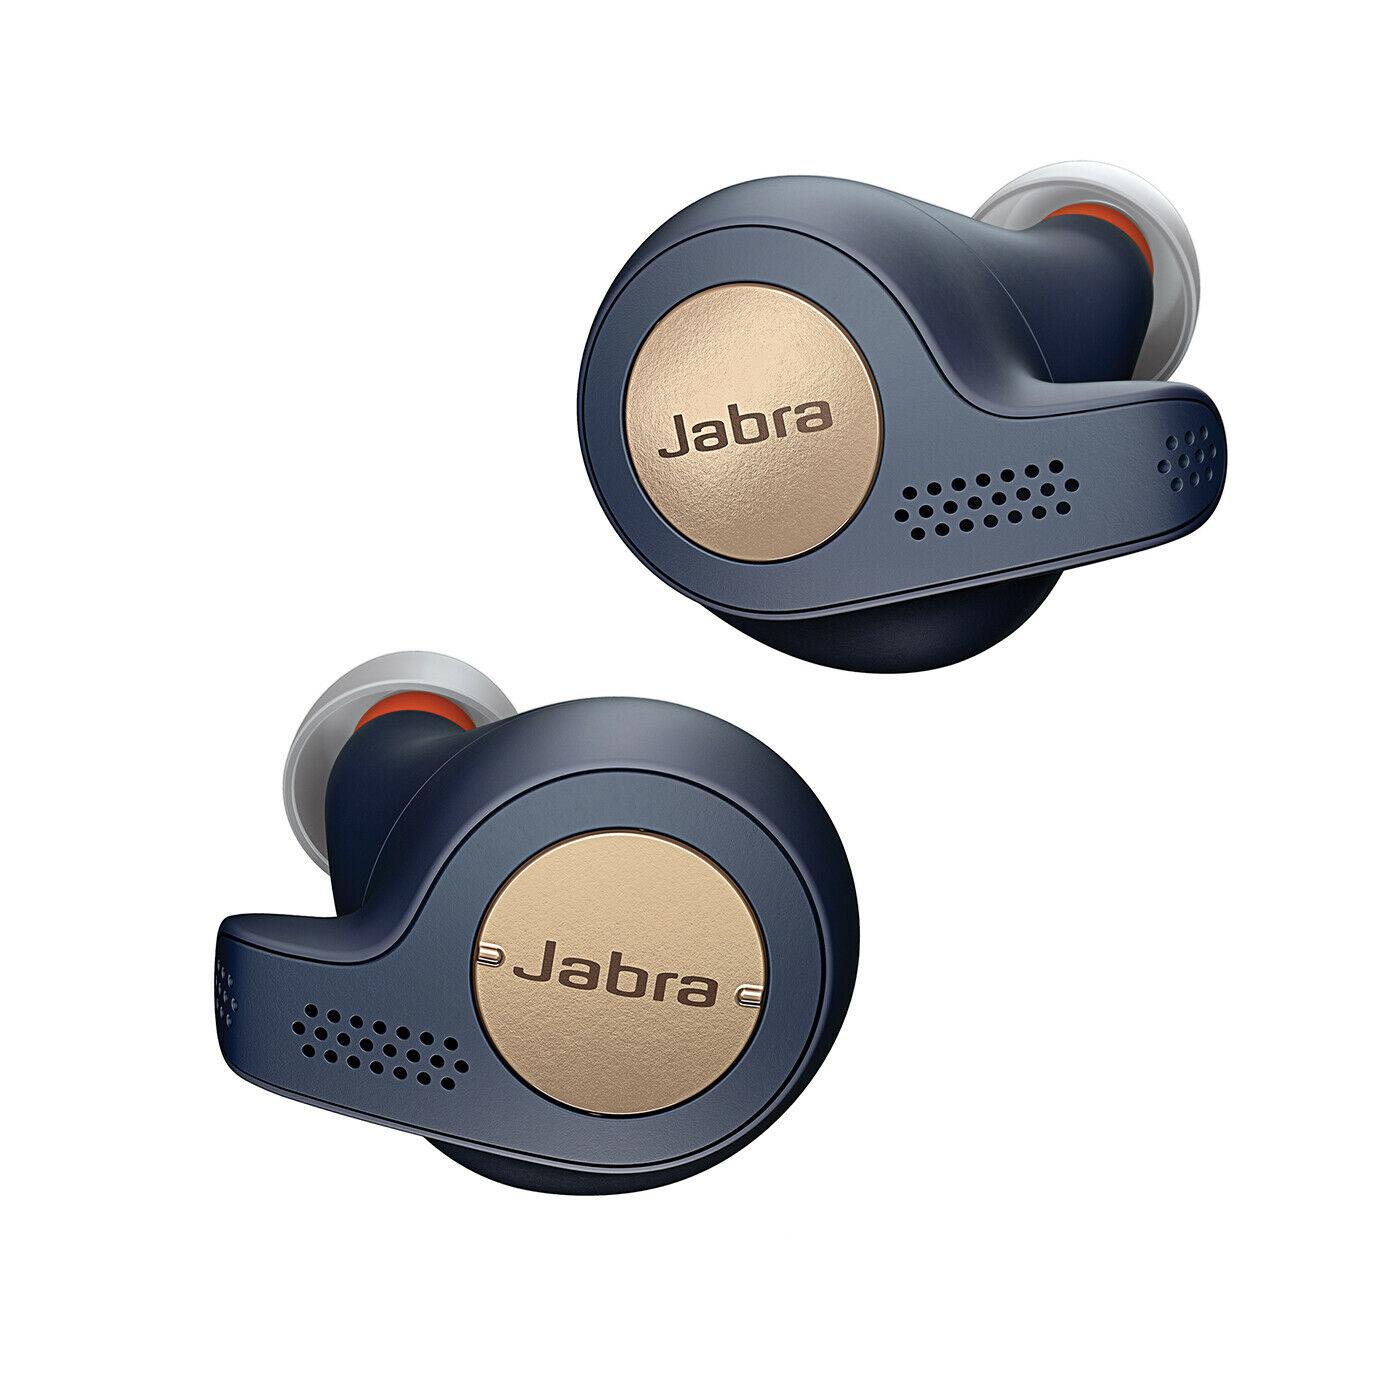 Jabra Elite Active 65t Accessory, Replacement Earbuds, Copper Blue £71.99 @ jabra-company-store-uk / eBay